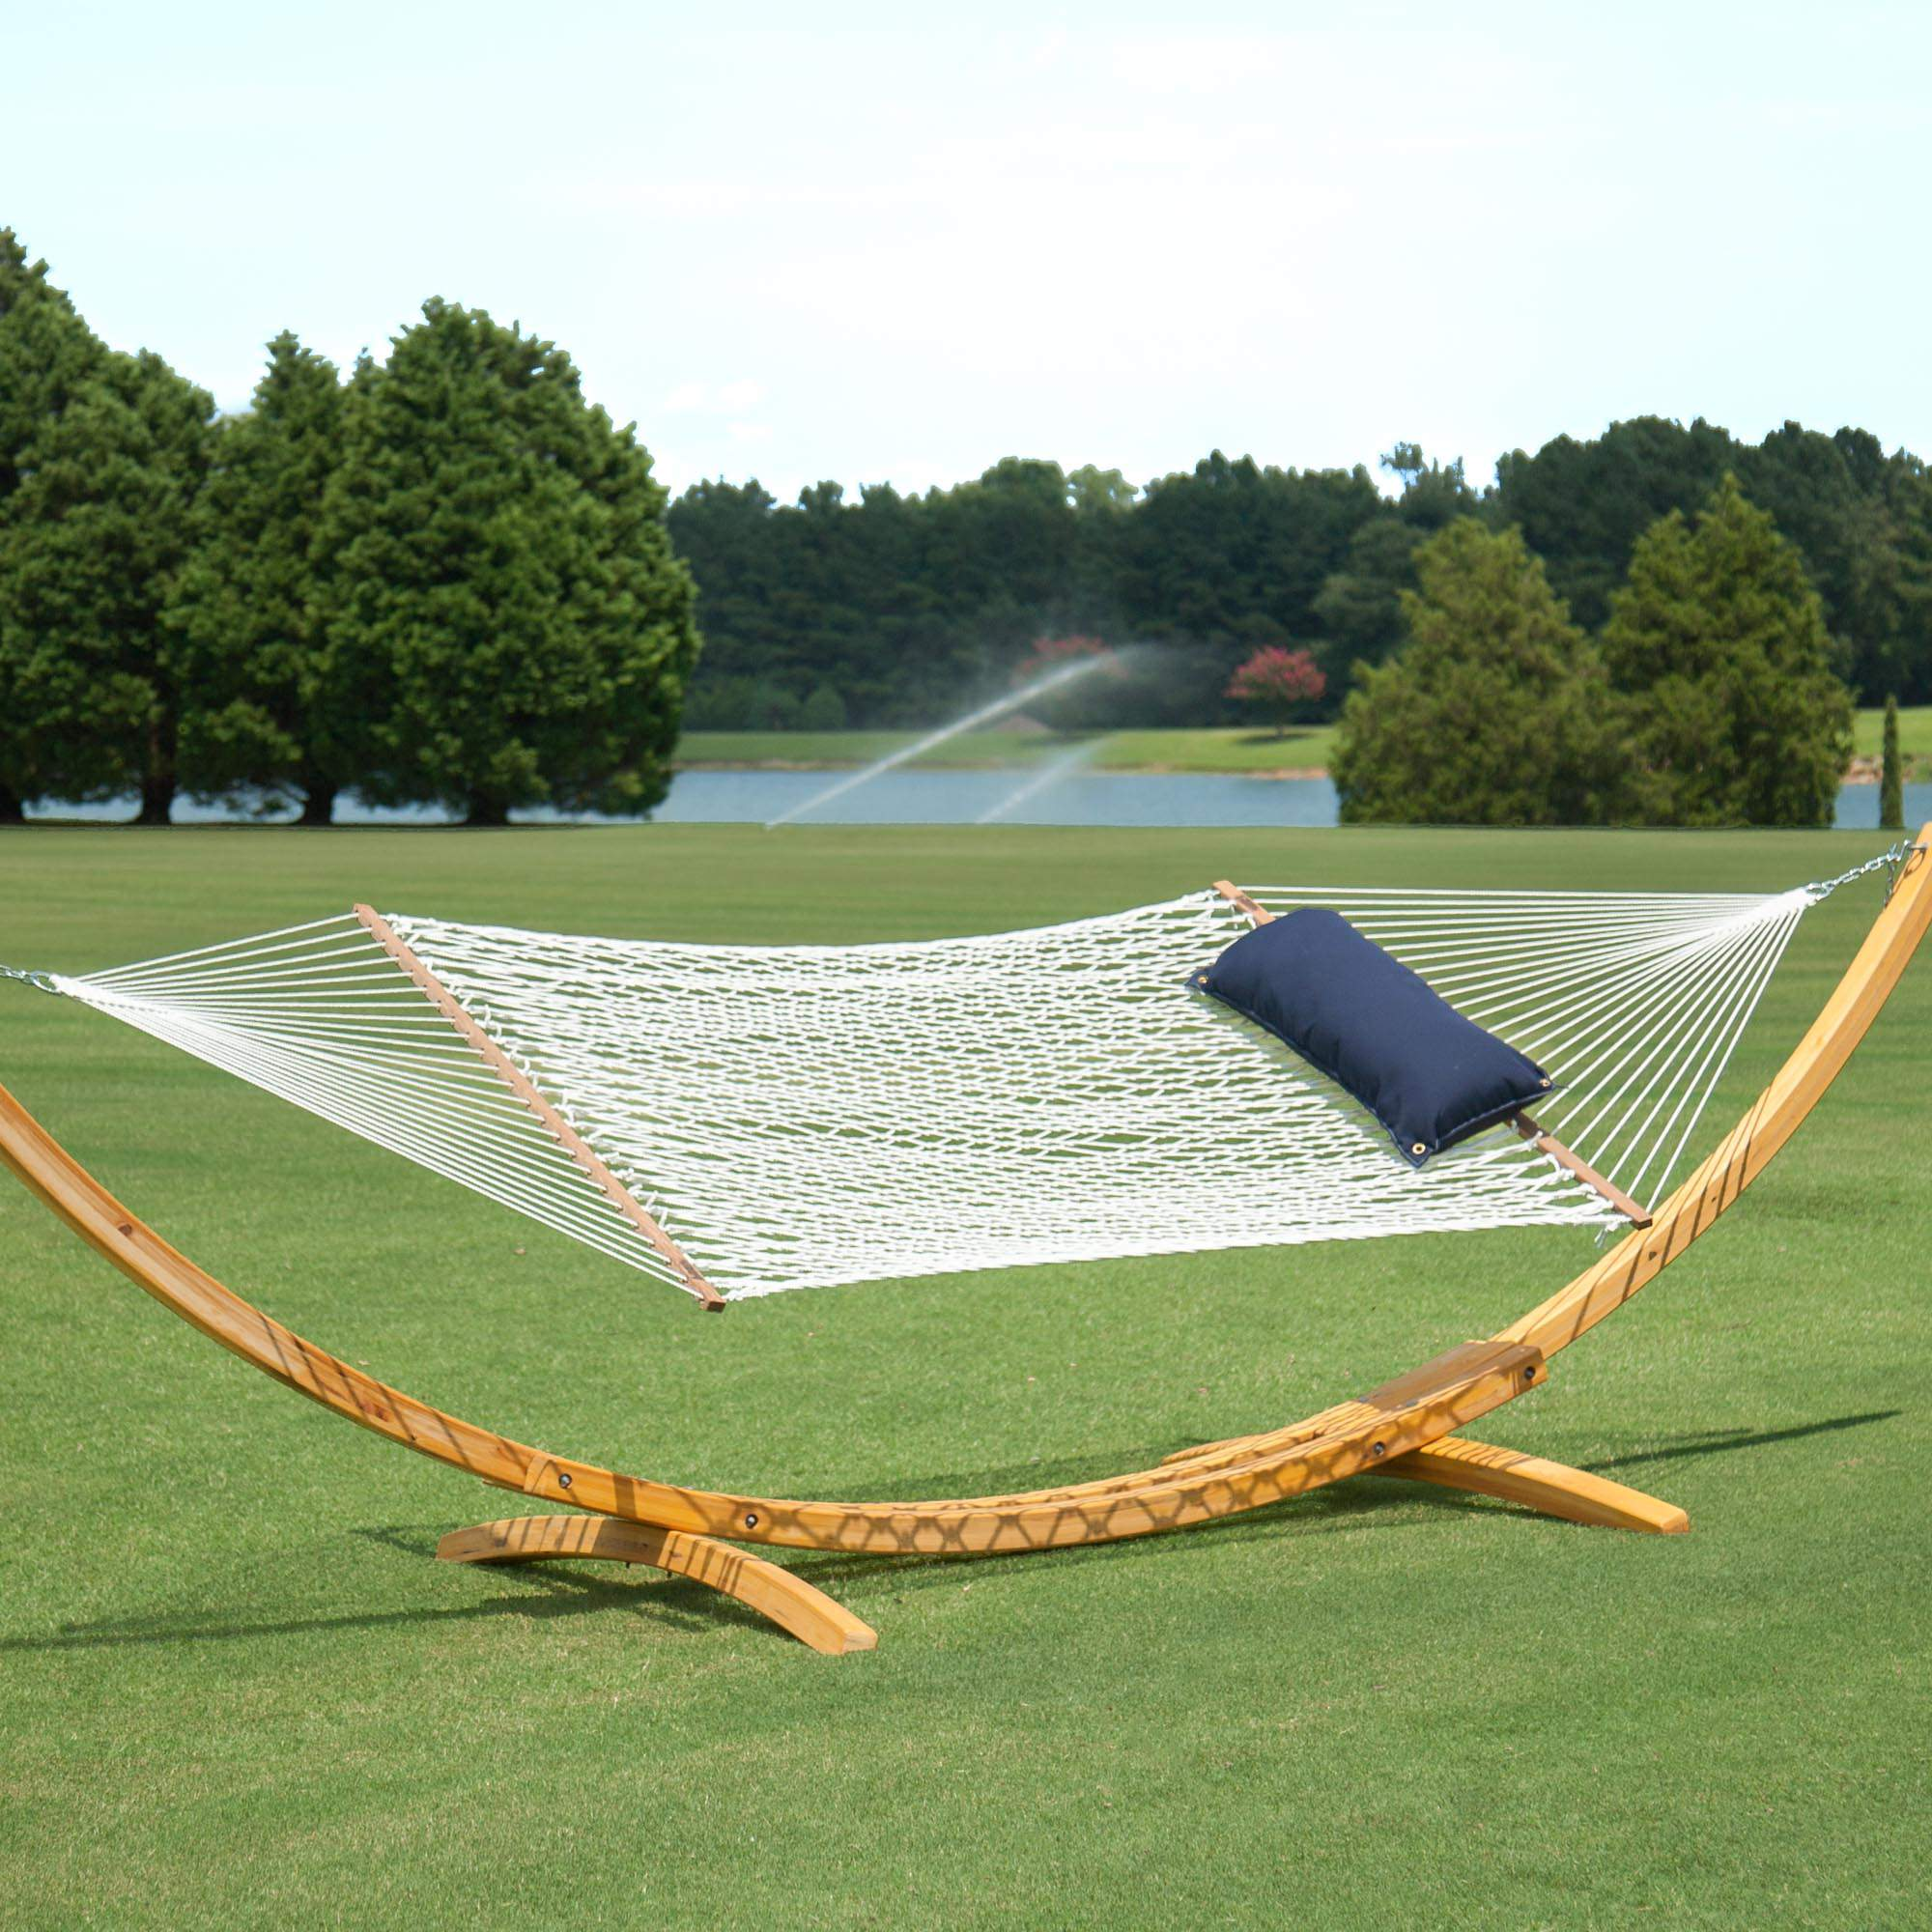 sunbrella tufted large hammock hammocks hatteras lagoon xx bevel